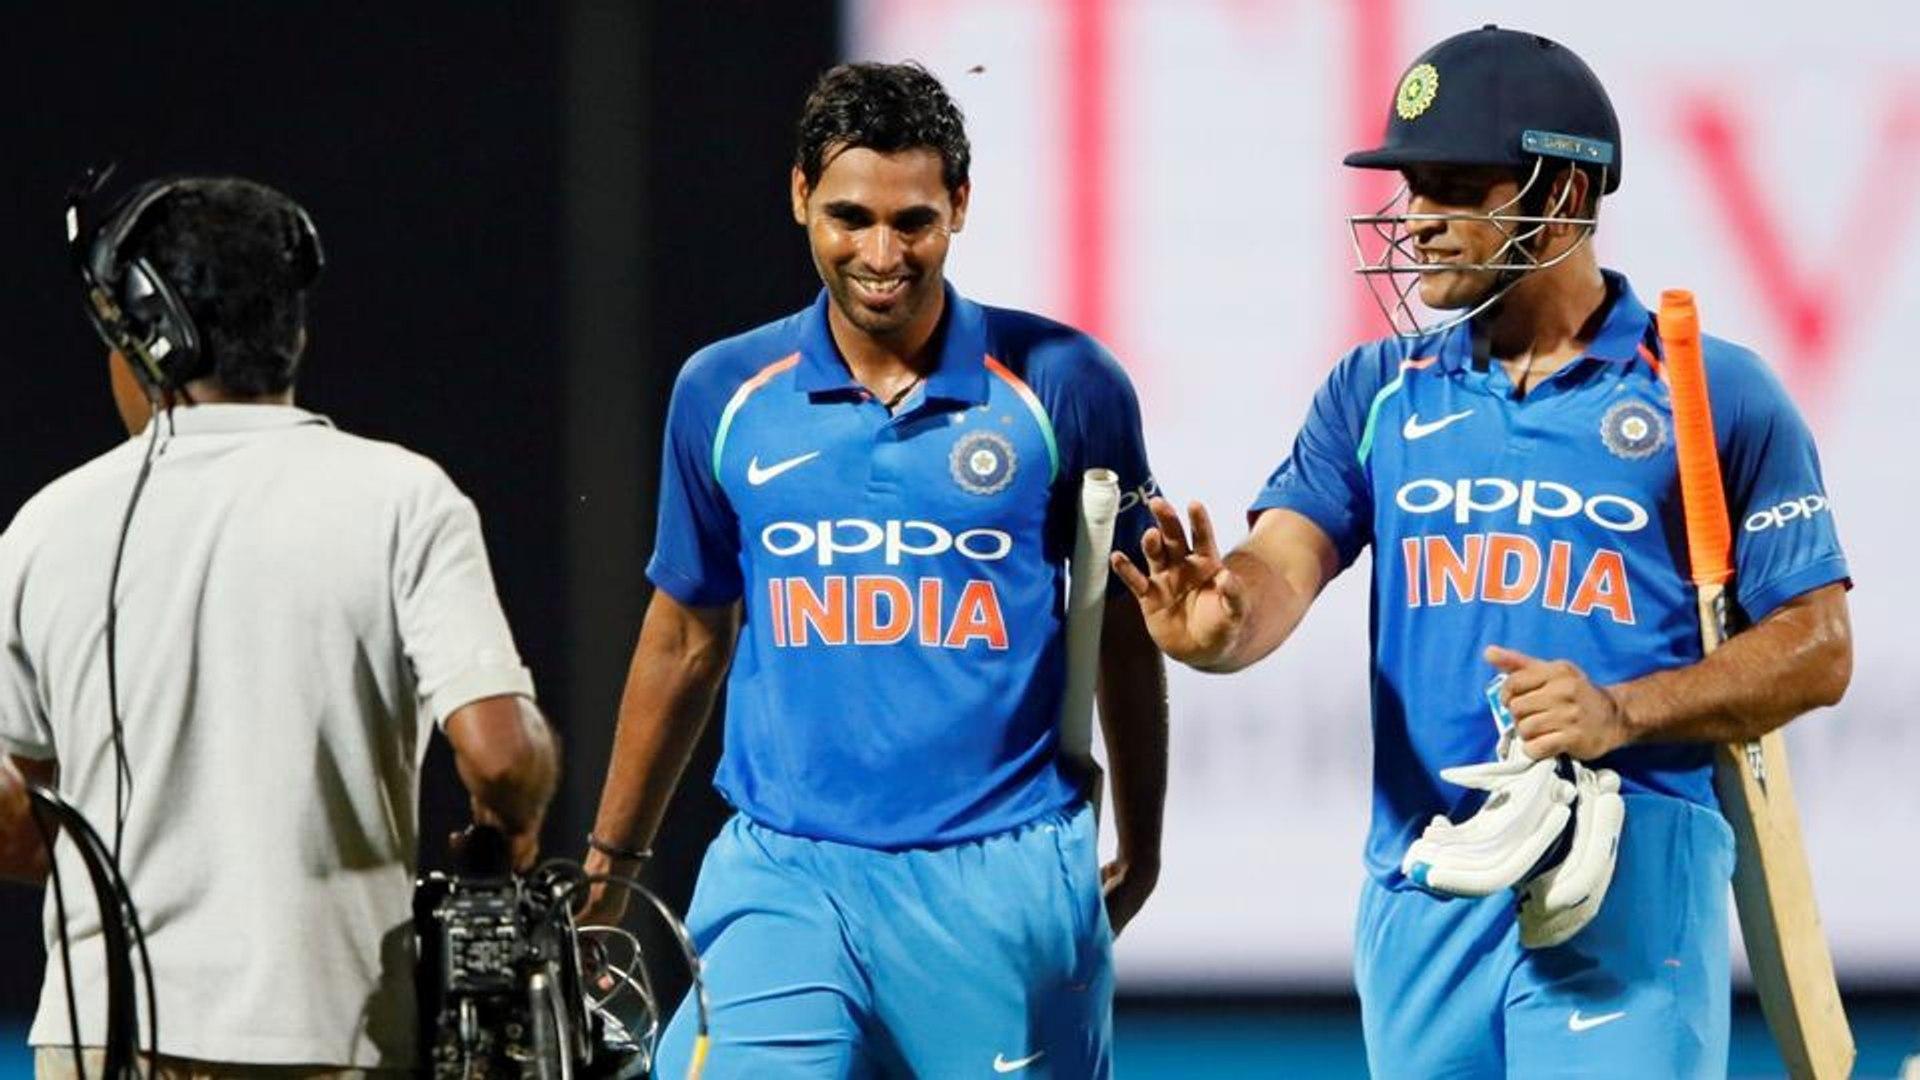 India Vs Sri Lanka 2nd ODI Highlights 13-12-2017 ** Highlights link in video Description - video Dailymotion